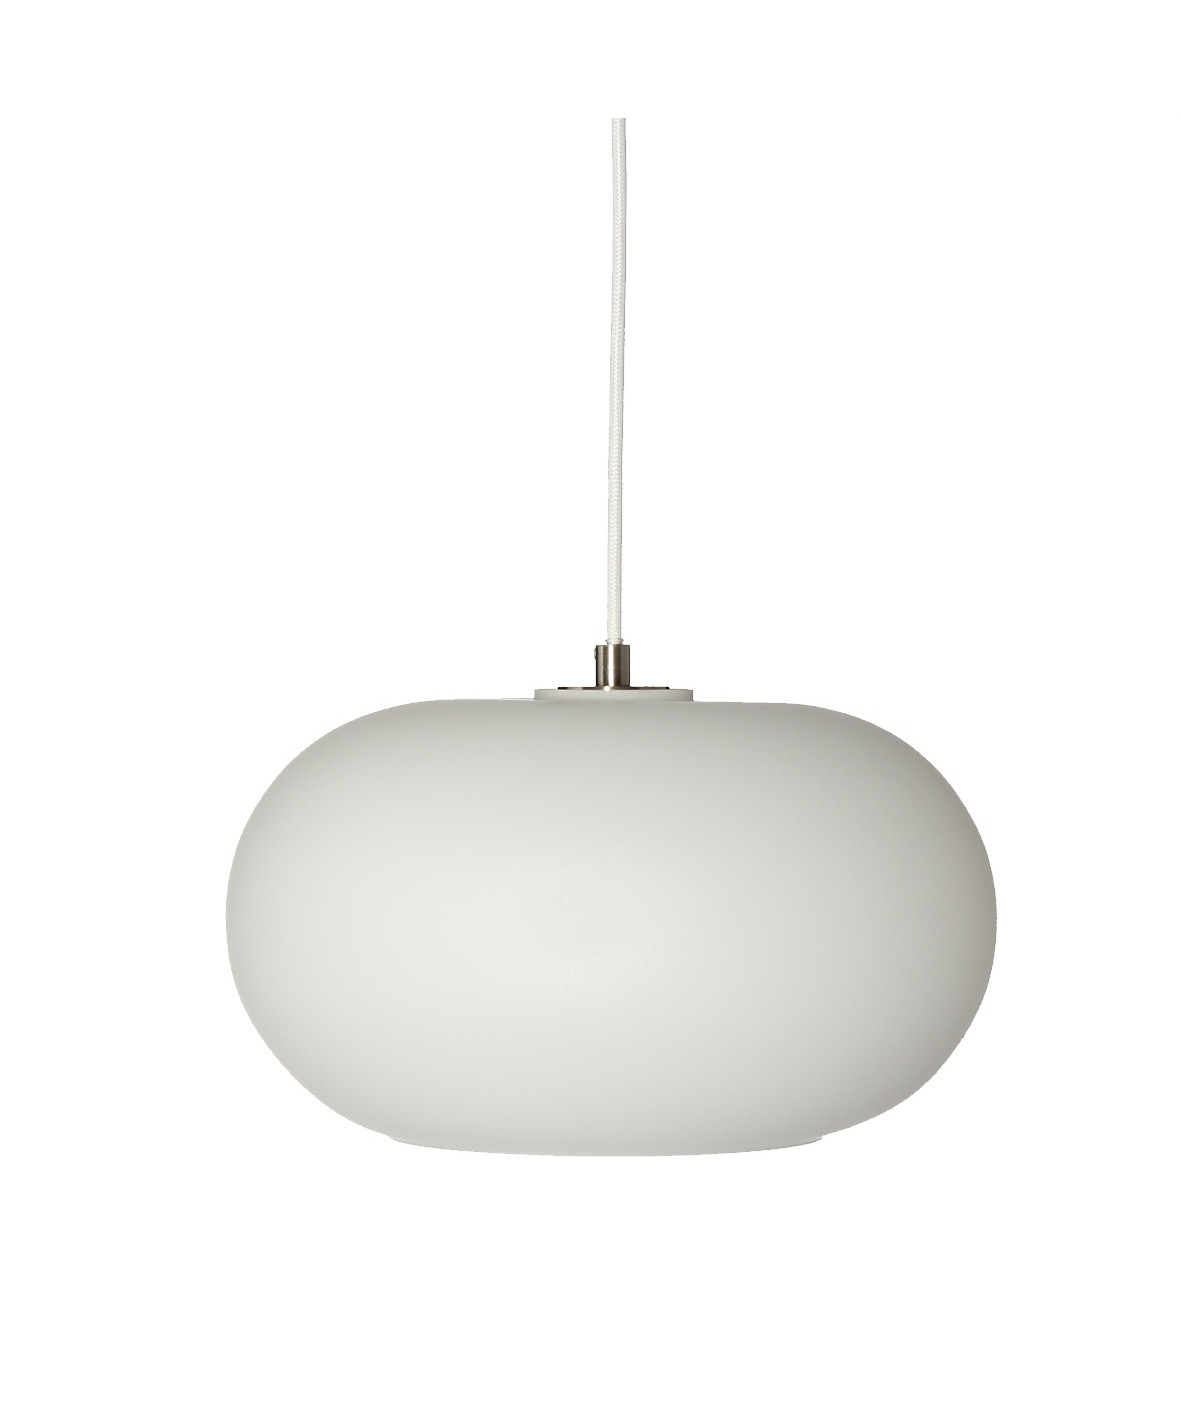 Image of   Kobe Glas Pendel Opal Mat Hvid - Frandsen